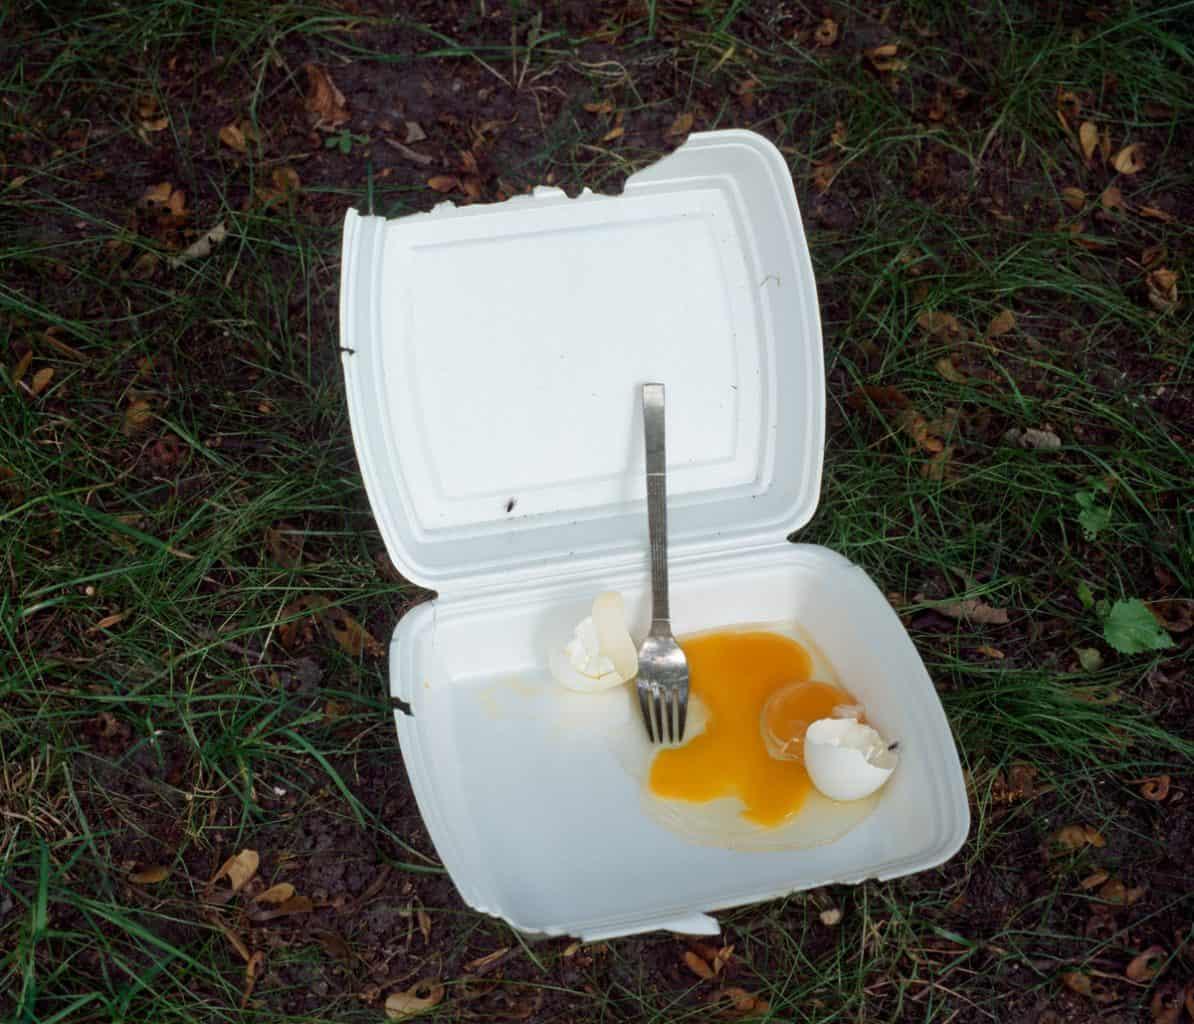 Two_Eggs_Bjoern-siebert@kunstraum_neudeli_leipzig